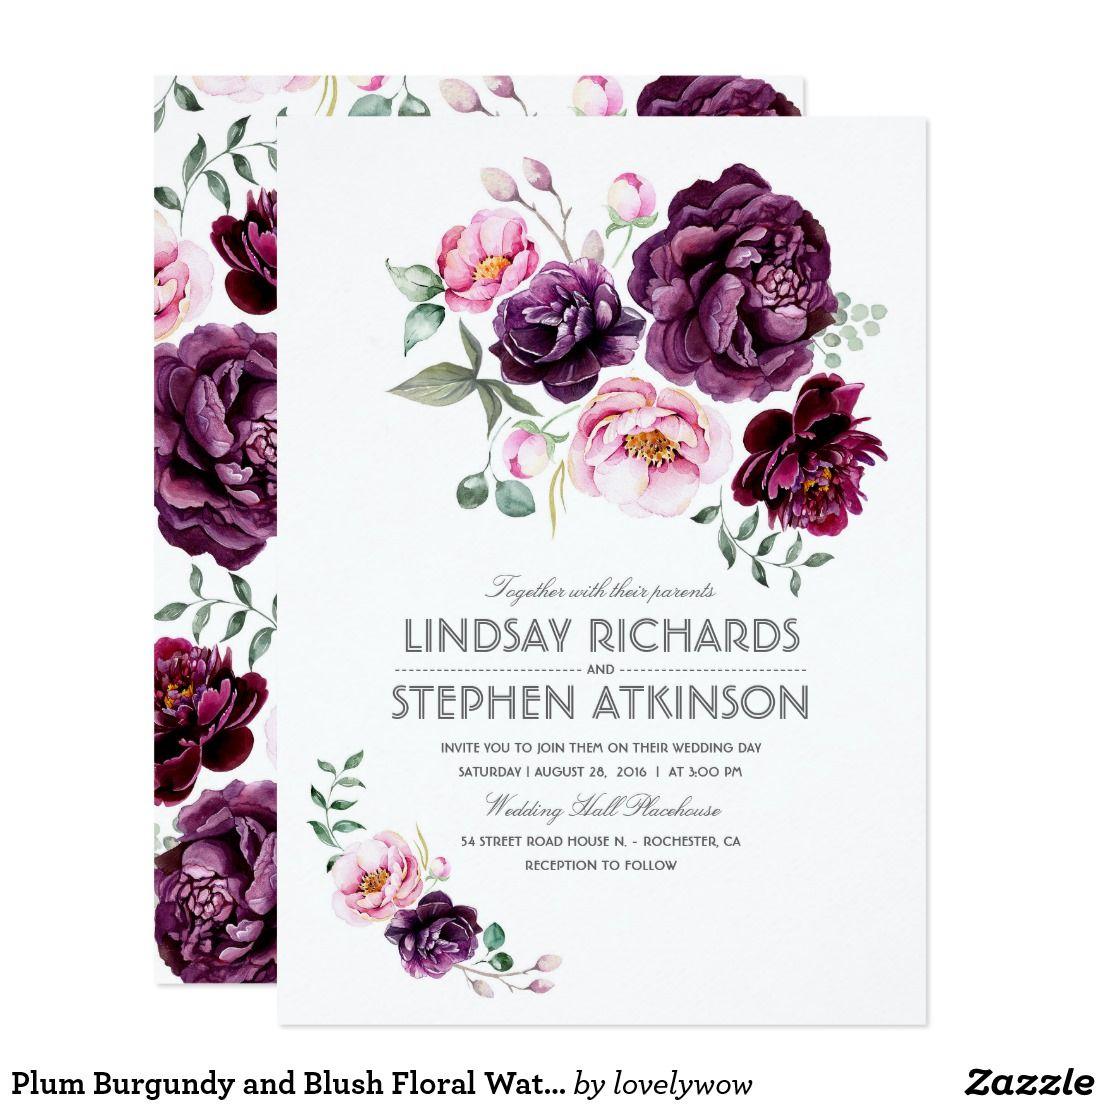 Plum Burgundy and Blush Floral Watercolor Wedding Card | Wedding ...